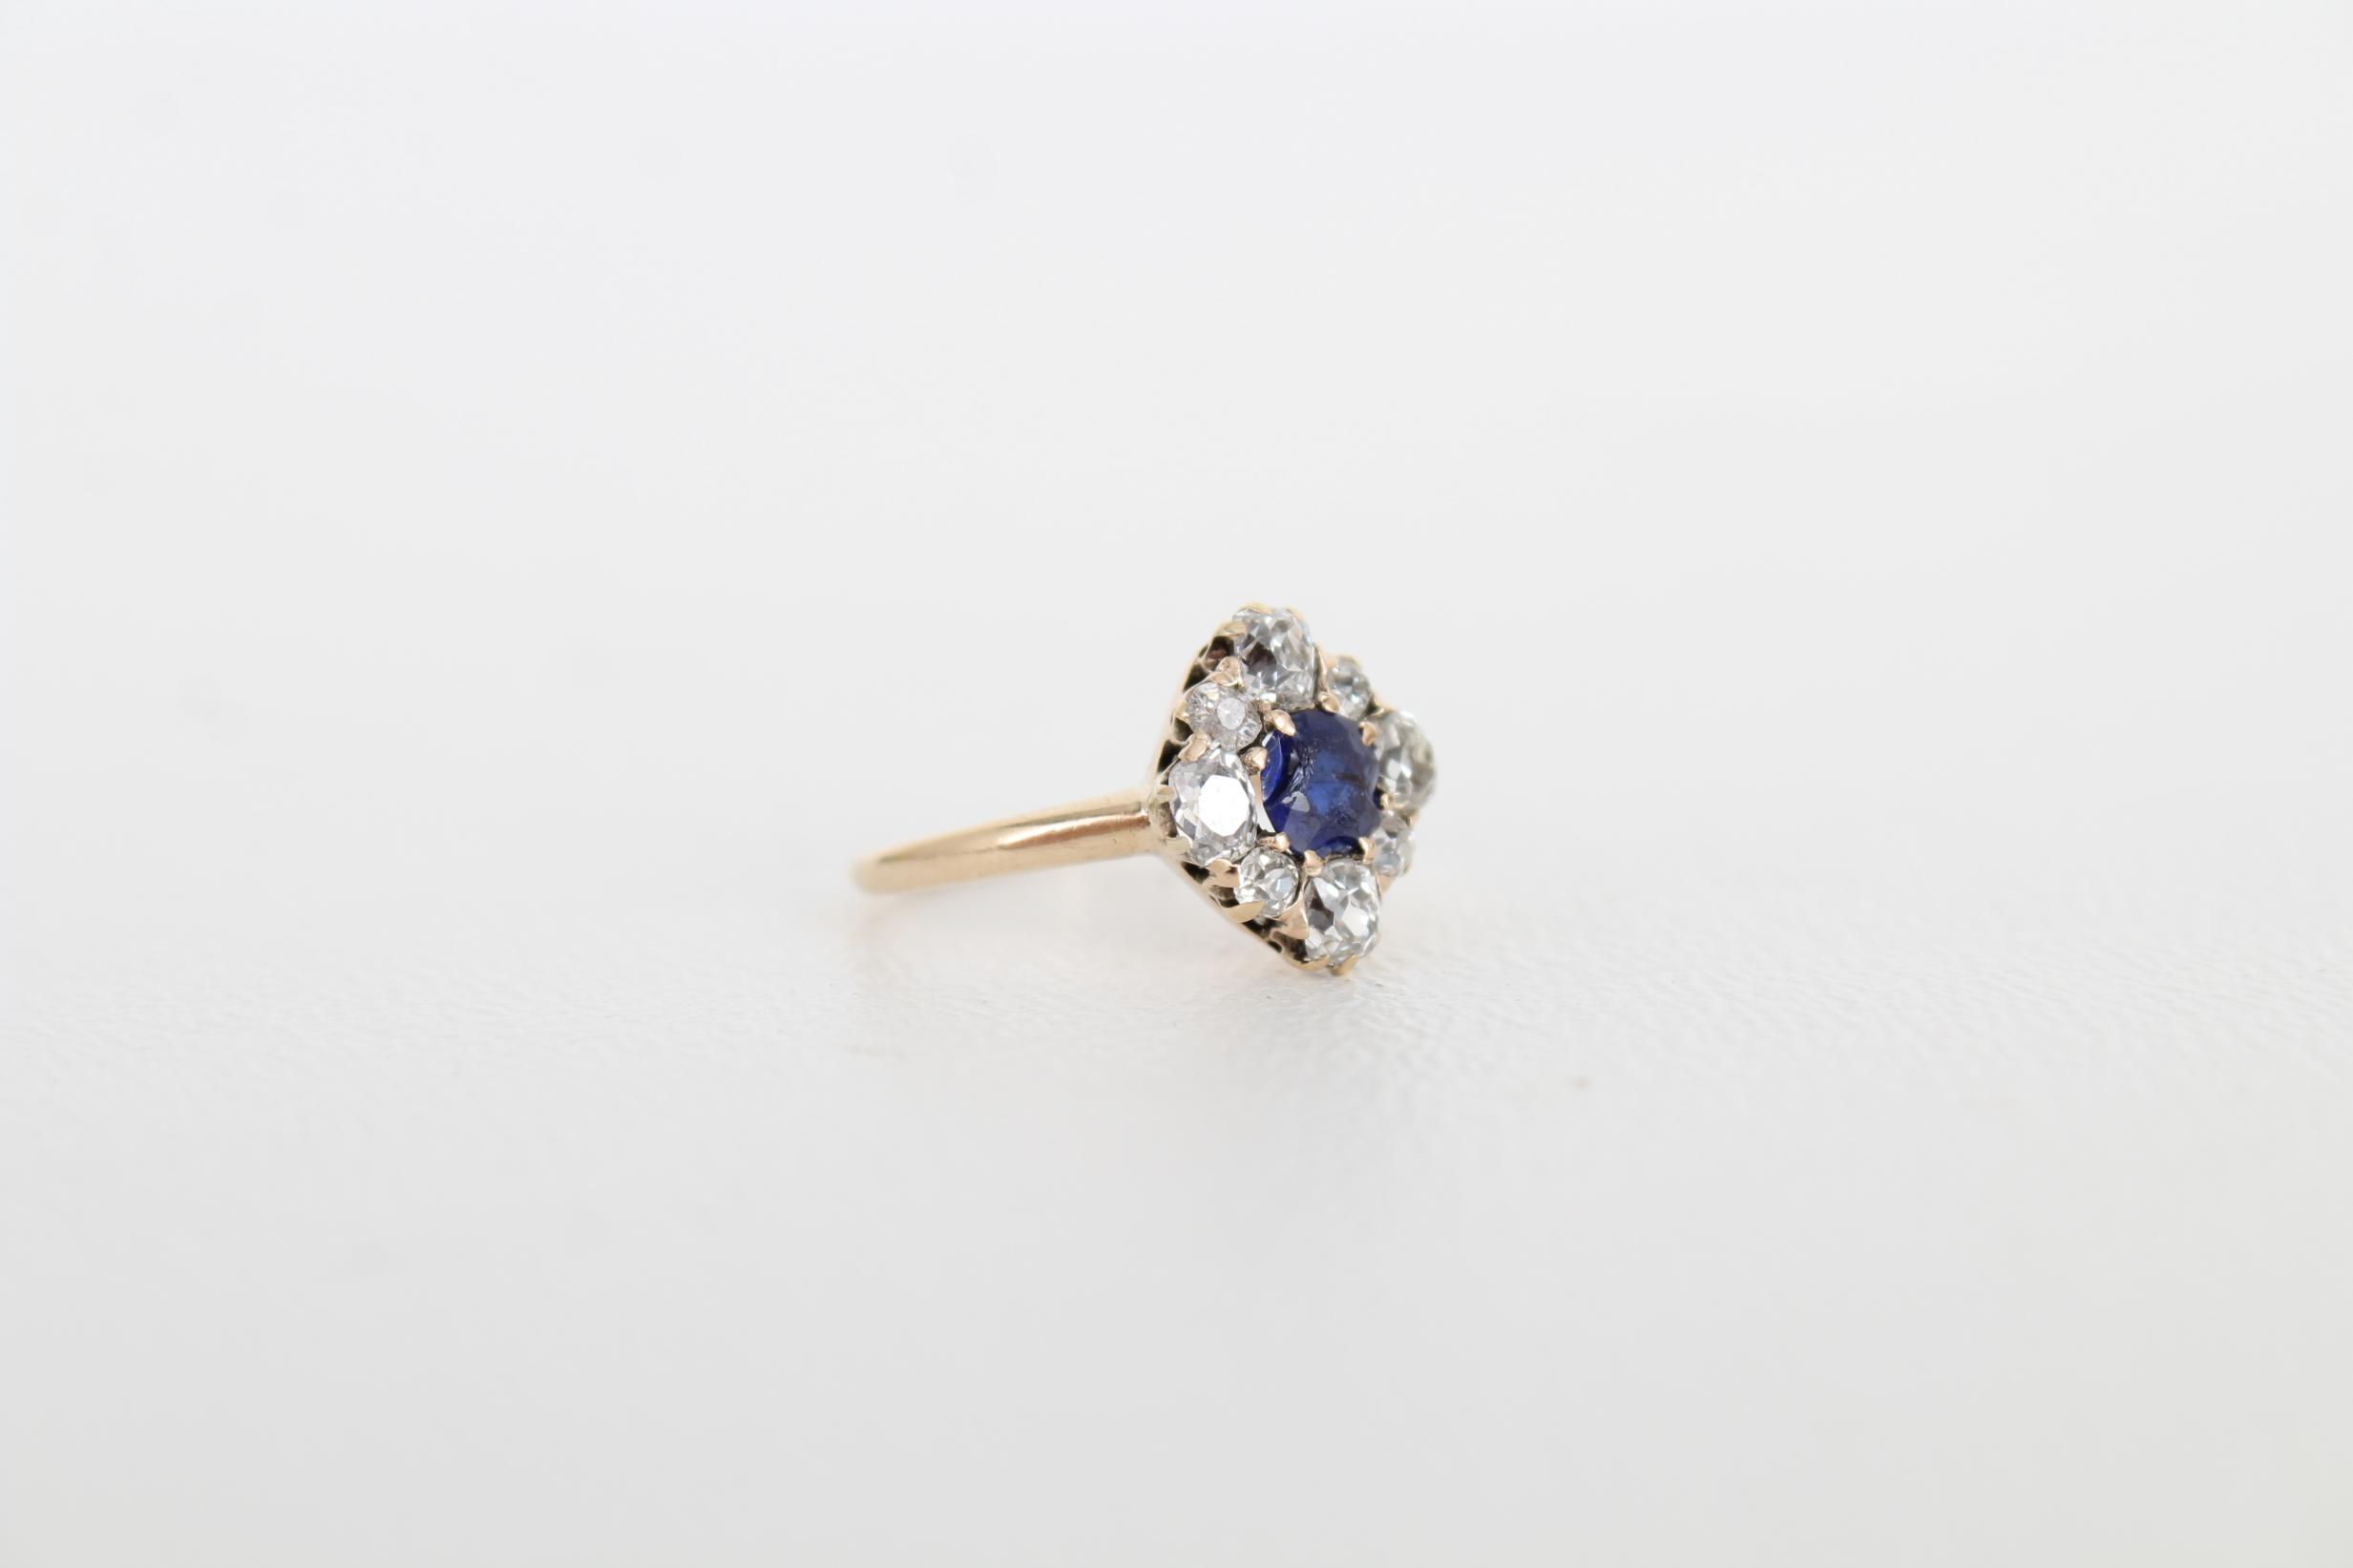 Sapphire & Diamond Petite Gold Ring - Image 5 of 6